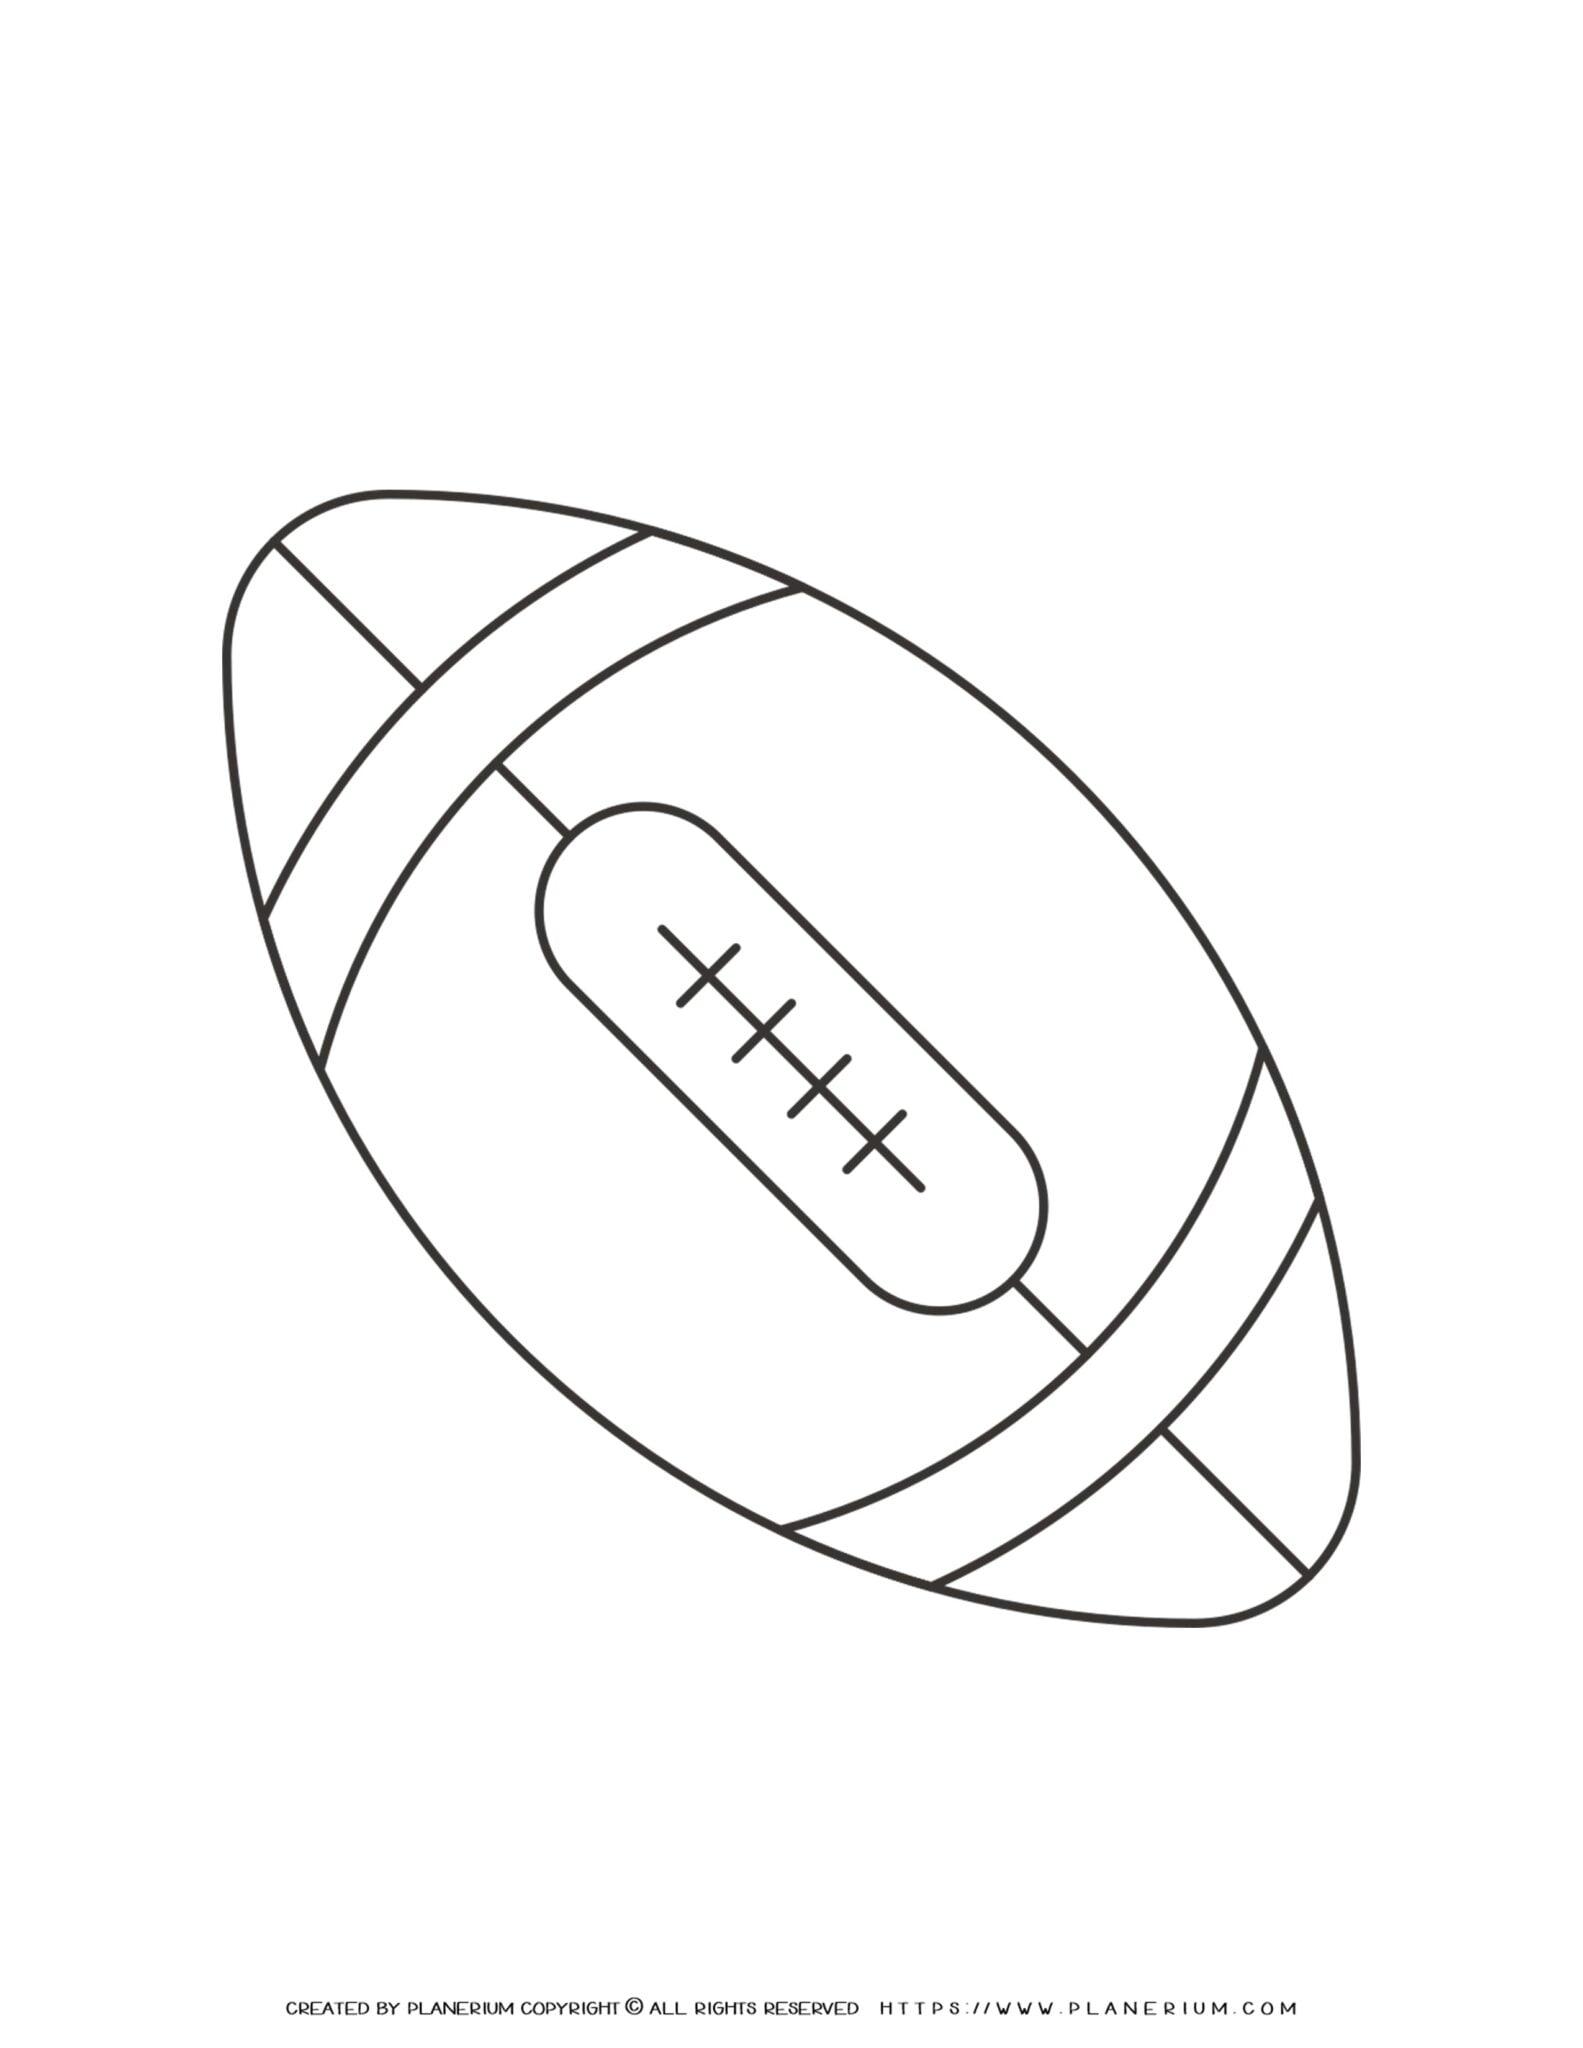 Sport Template - American Football   Planerium